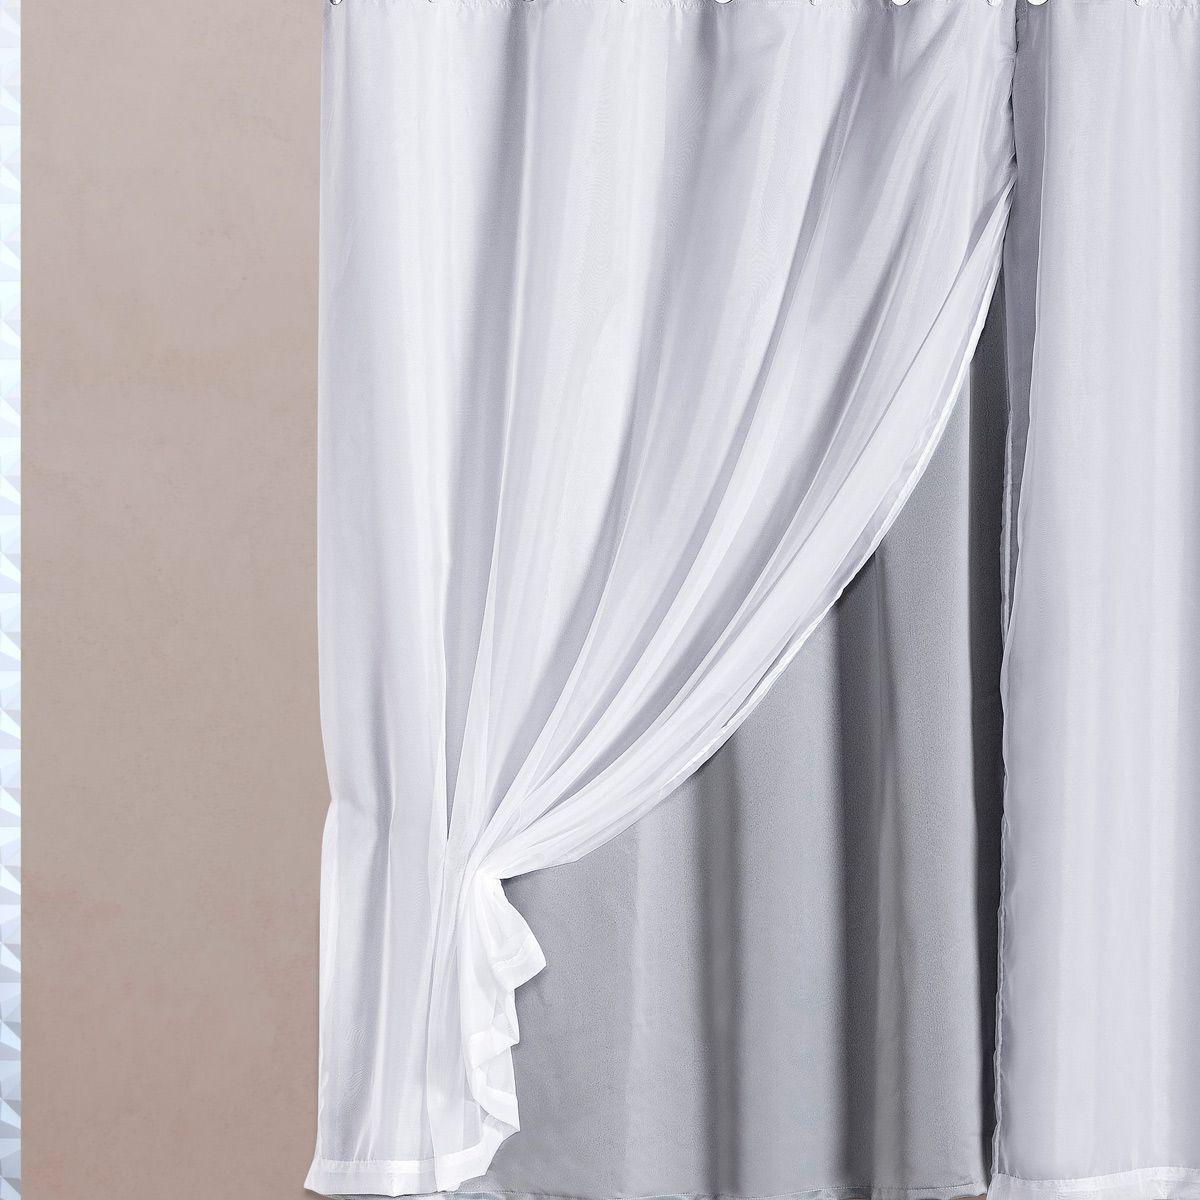 Cortina Blackout em Tecido Class c/ Voil Gelo/Branco Corta Luz 2,80m x 1,60m